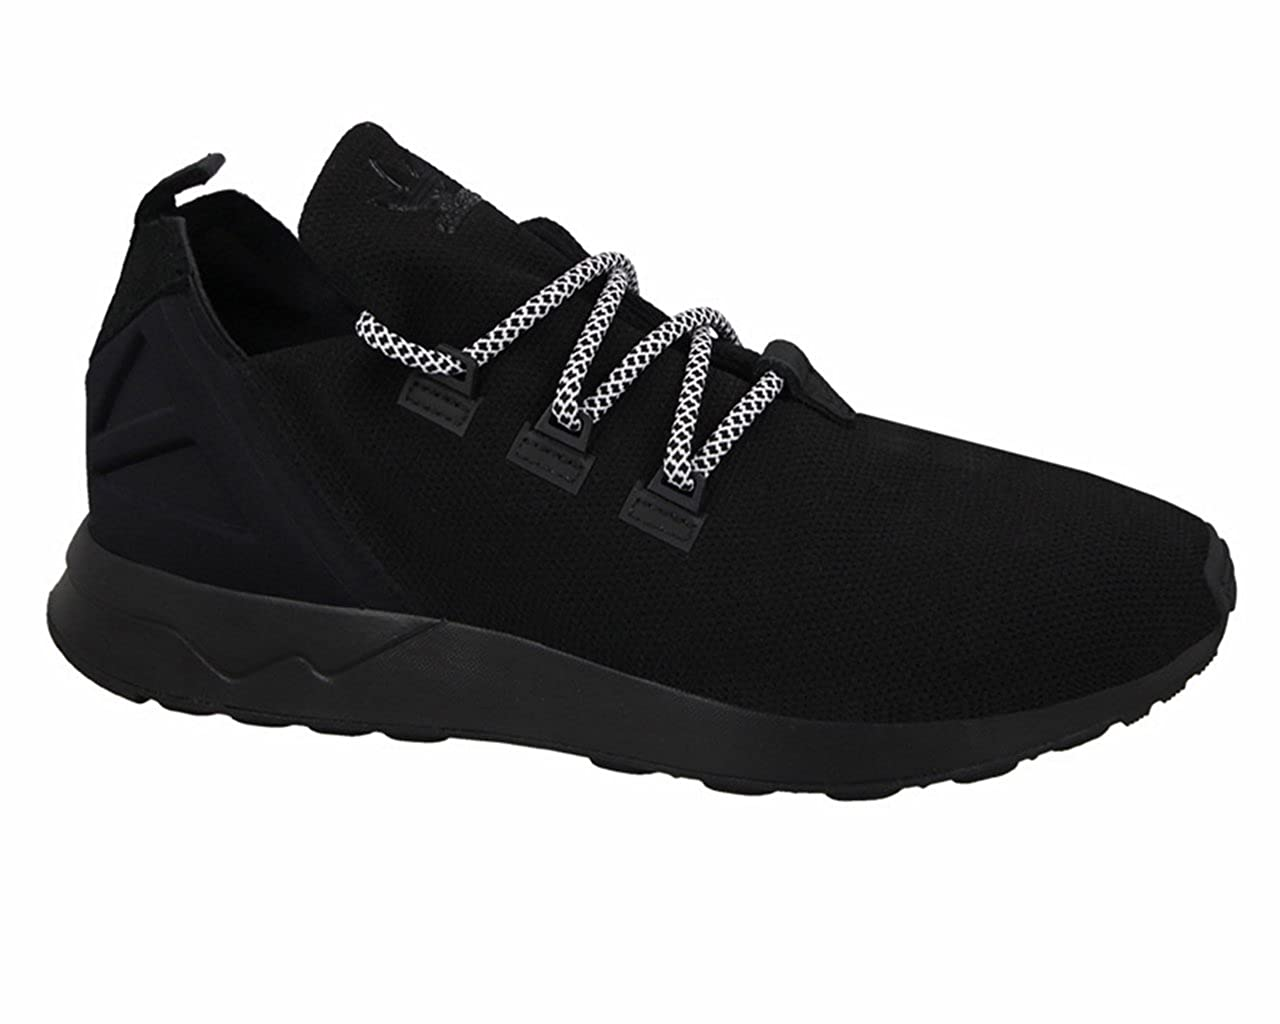 Adidas Women adidas originals zx flux adv x b49404 black